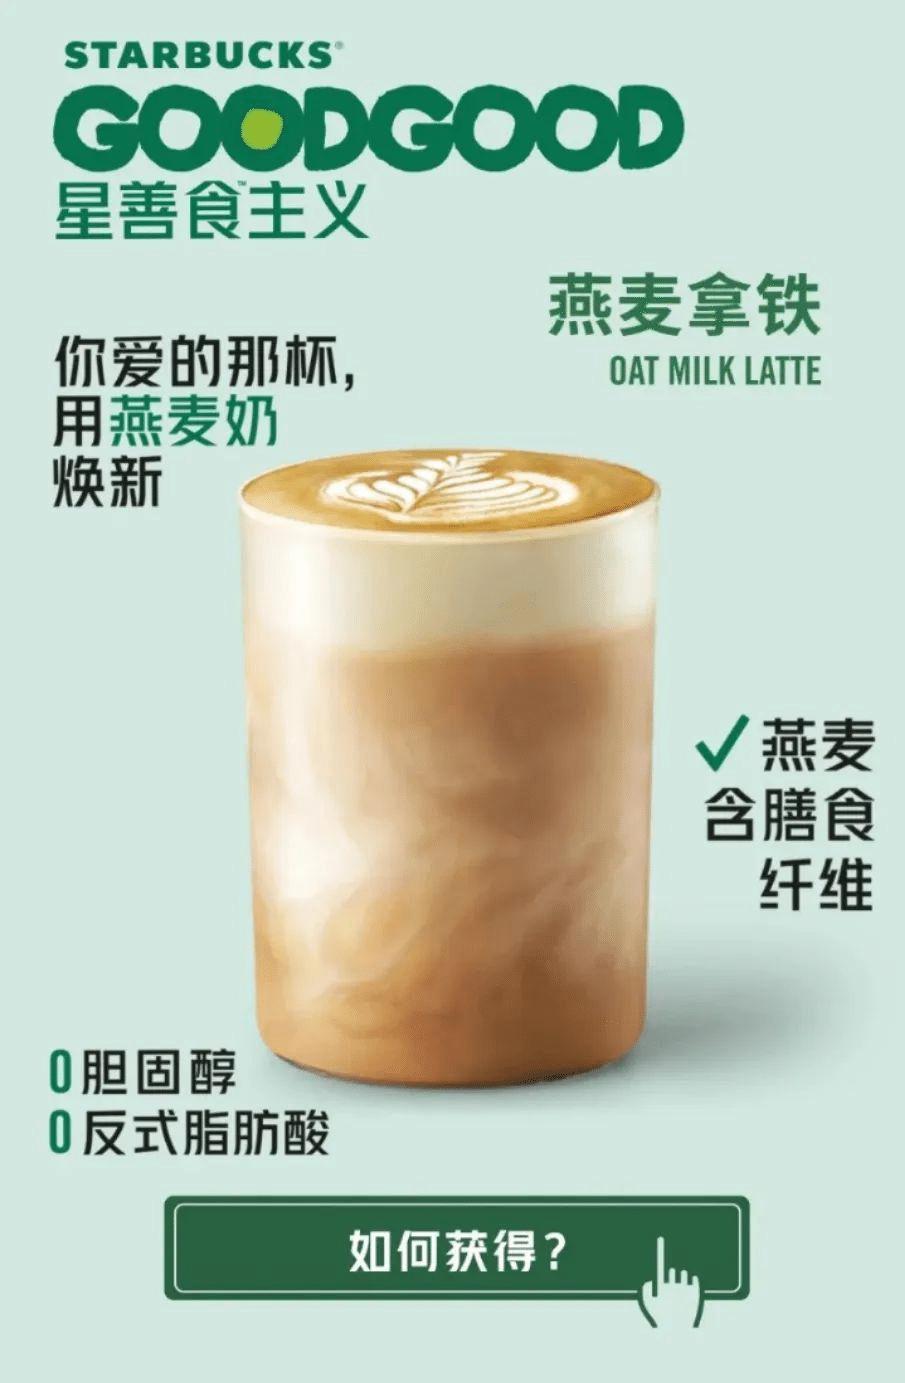 Starbucks offering free coffee - food tech news in Asia